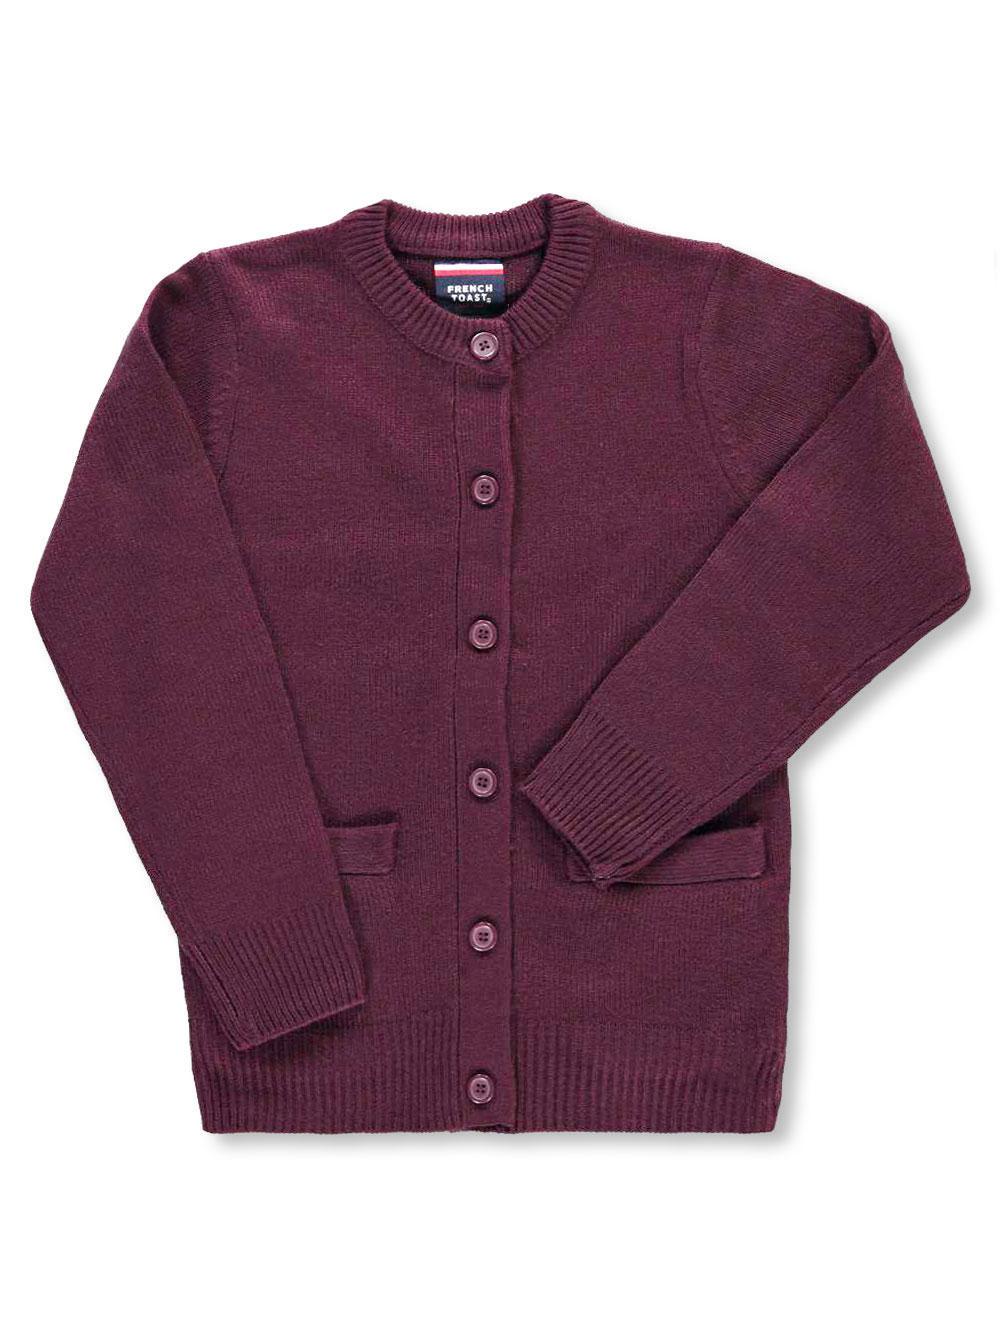 French Toast Girls Knit Cardigan Sweater